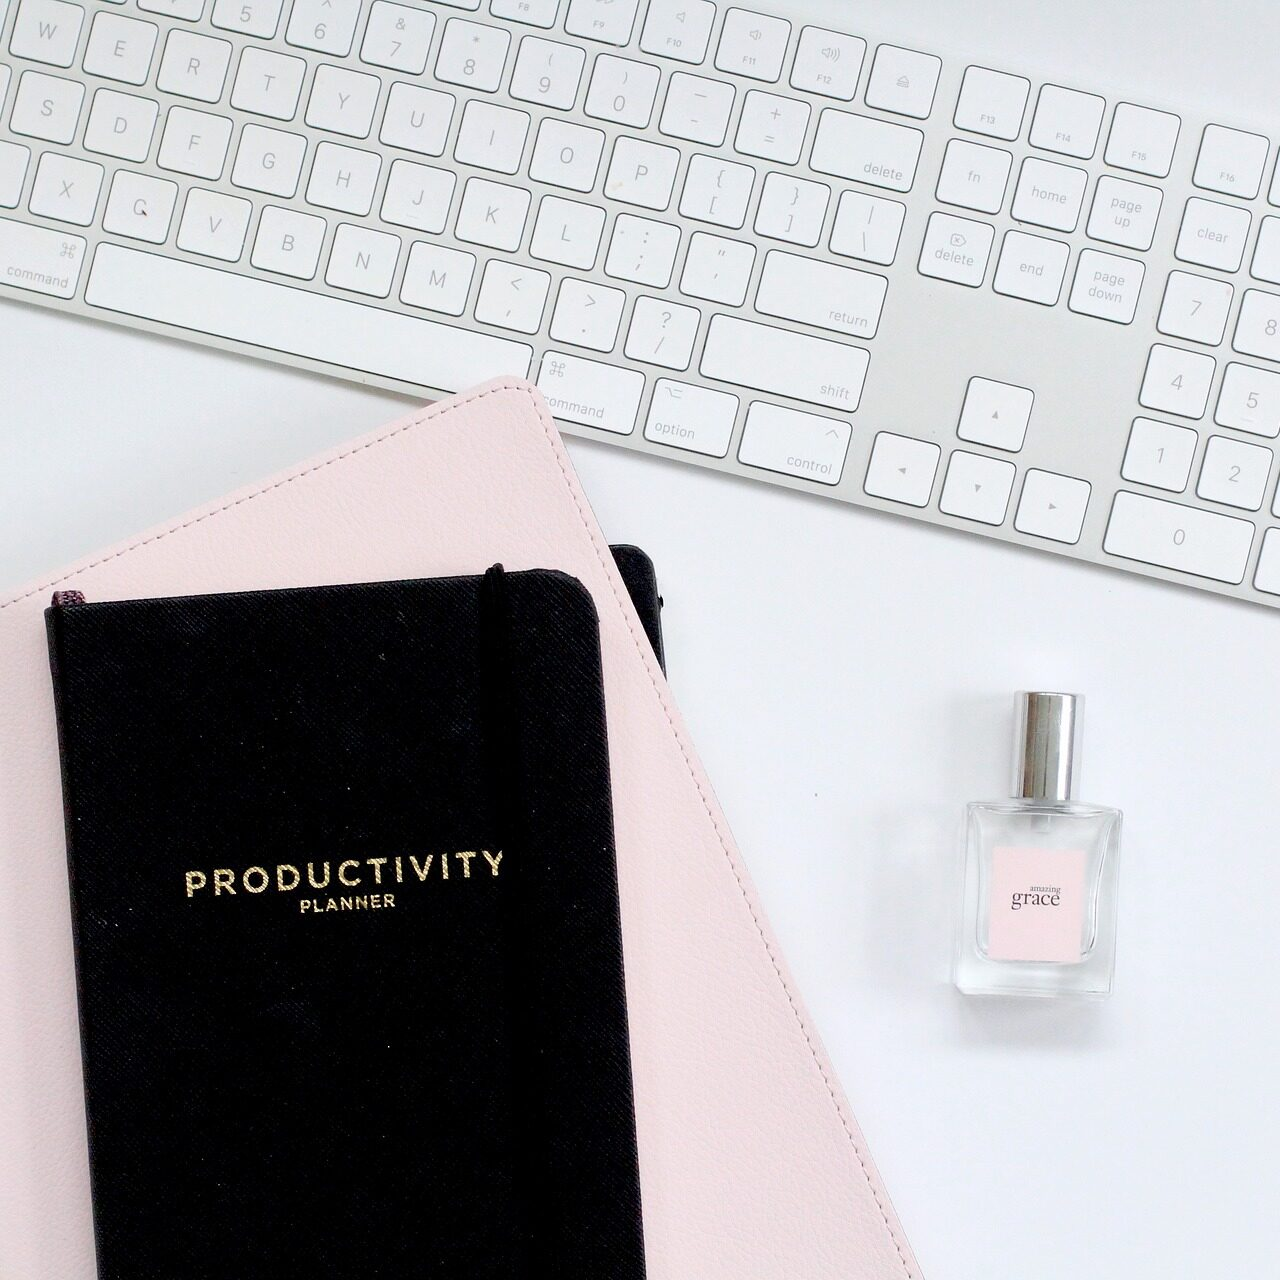 productivity-marketing-planner-latest-digital-marketing-trends-2020-shirudigi